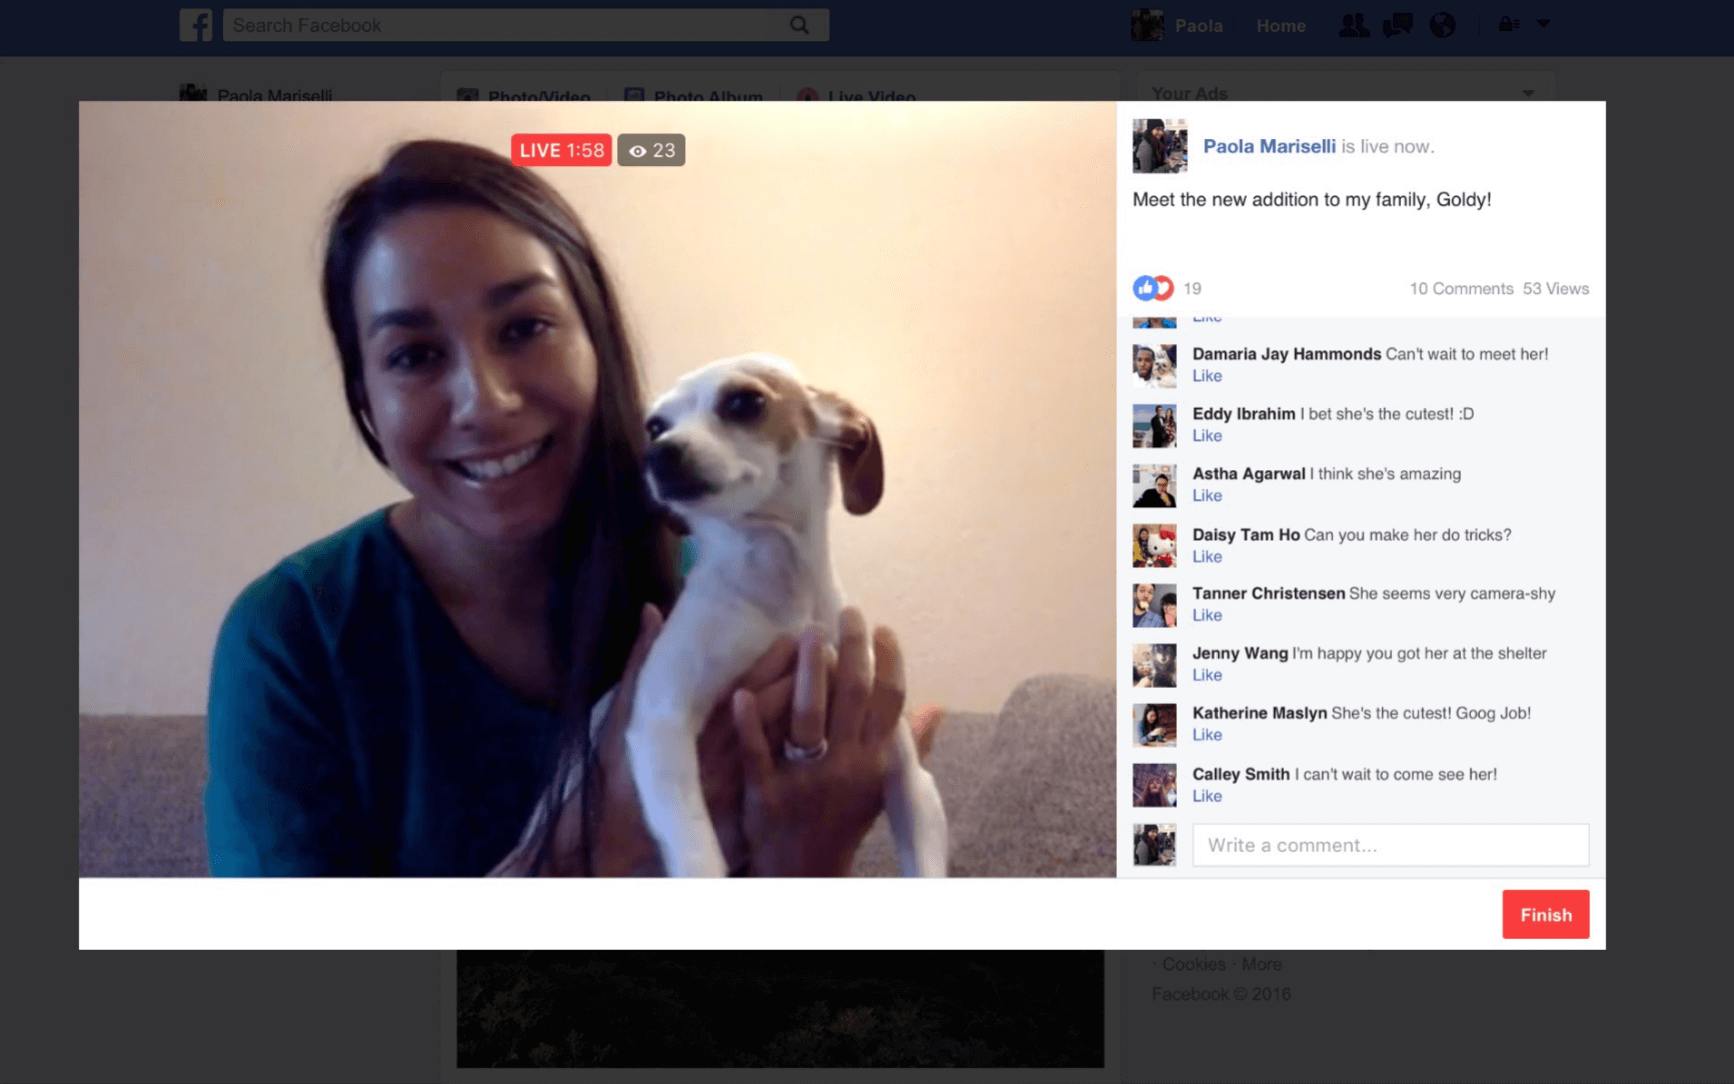 Làm sao để tăng View Facebook? Với Simple Facebook mọi chuyện trở ...